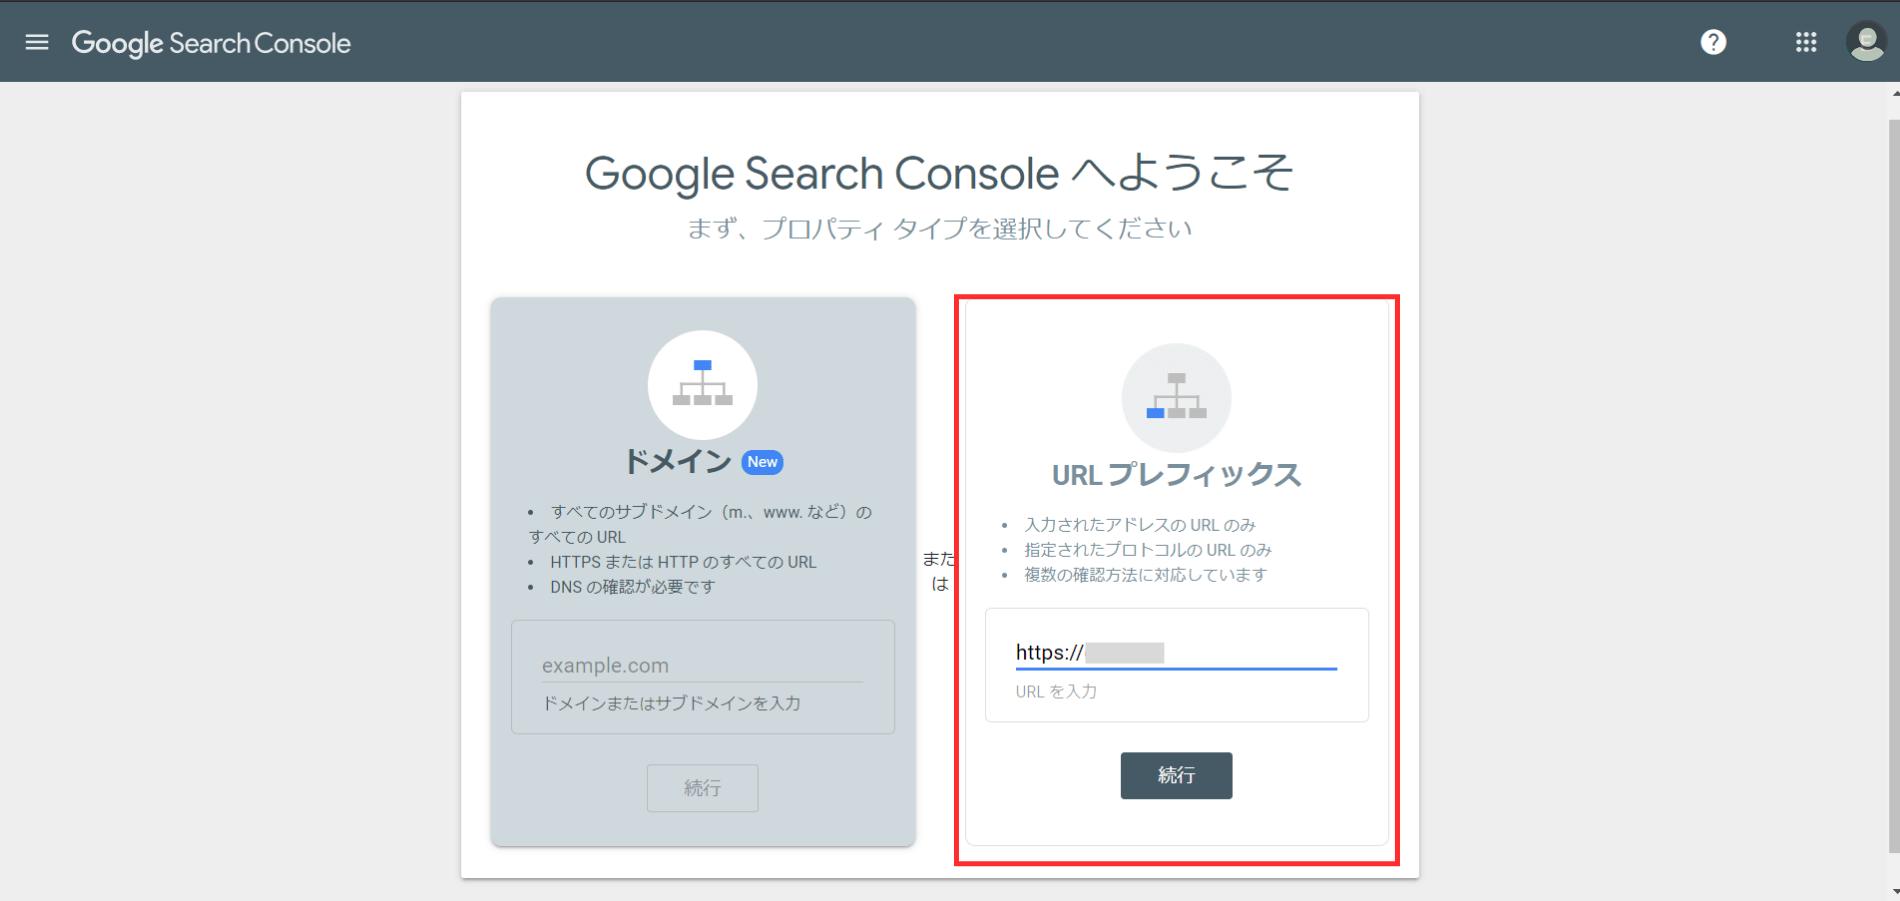 WordPressブログにGoogleサーチコンソールを設定する手順3